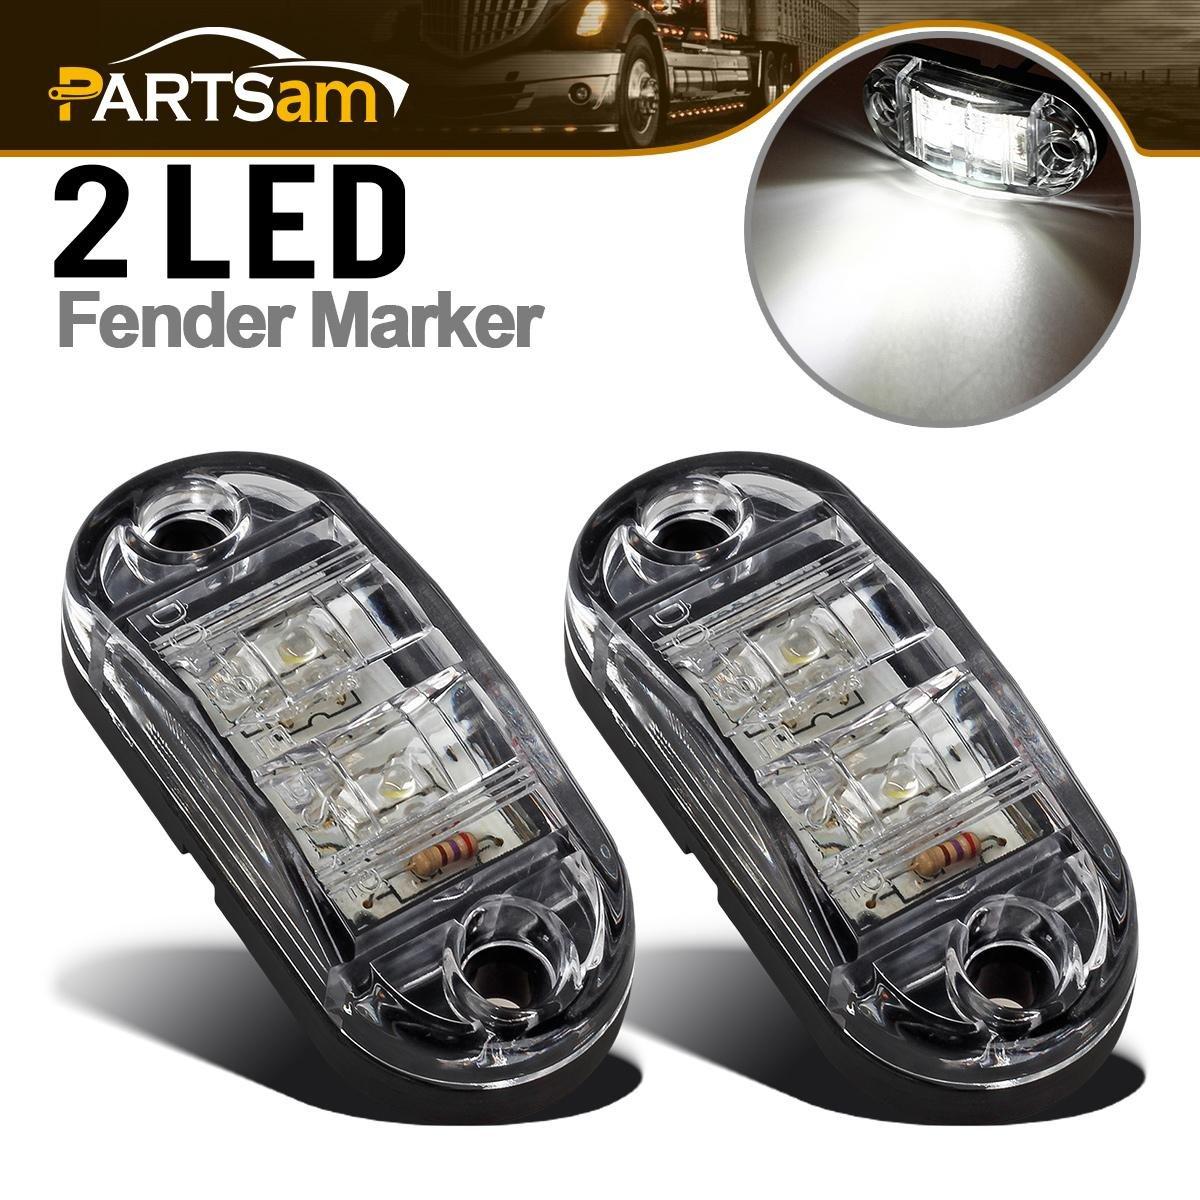 "Partsam 2X Trailer Truck Surface Mount LED Oval 2.5"" White Side Marker Lamp Bulb 2 Diodes, Sealed Oval Trailer Clearance and Side Marker Lights, Boat Marine Led Lights"